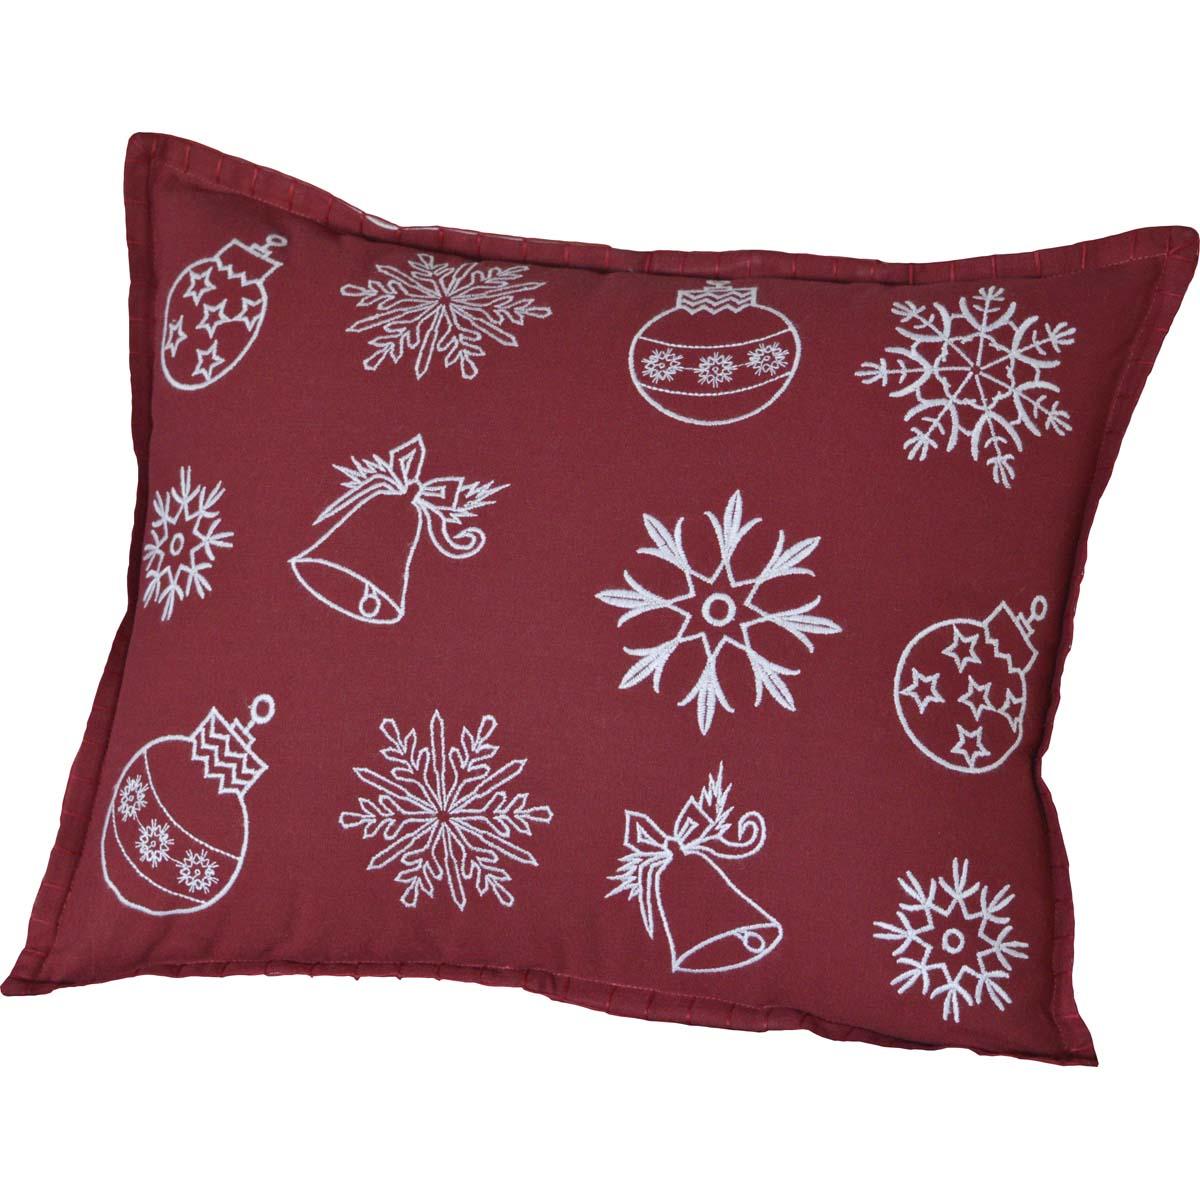 Snow Ornaments Pillow 14x18